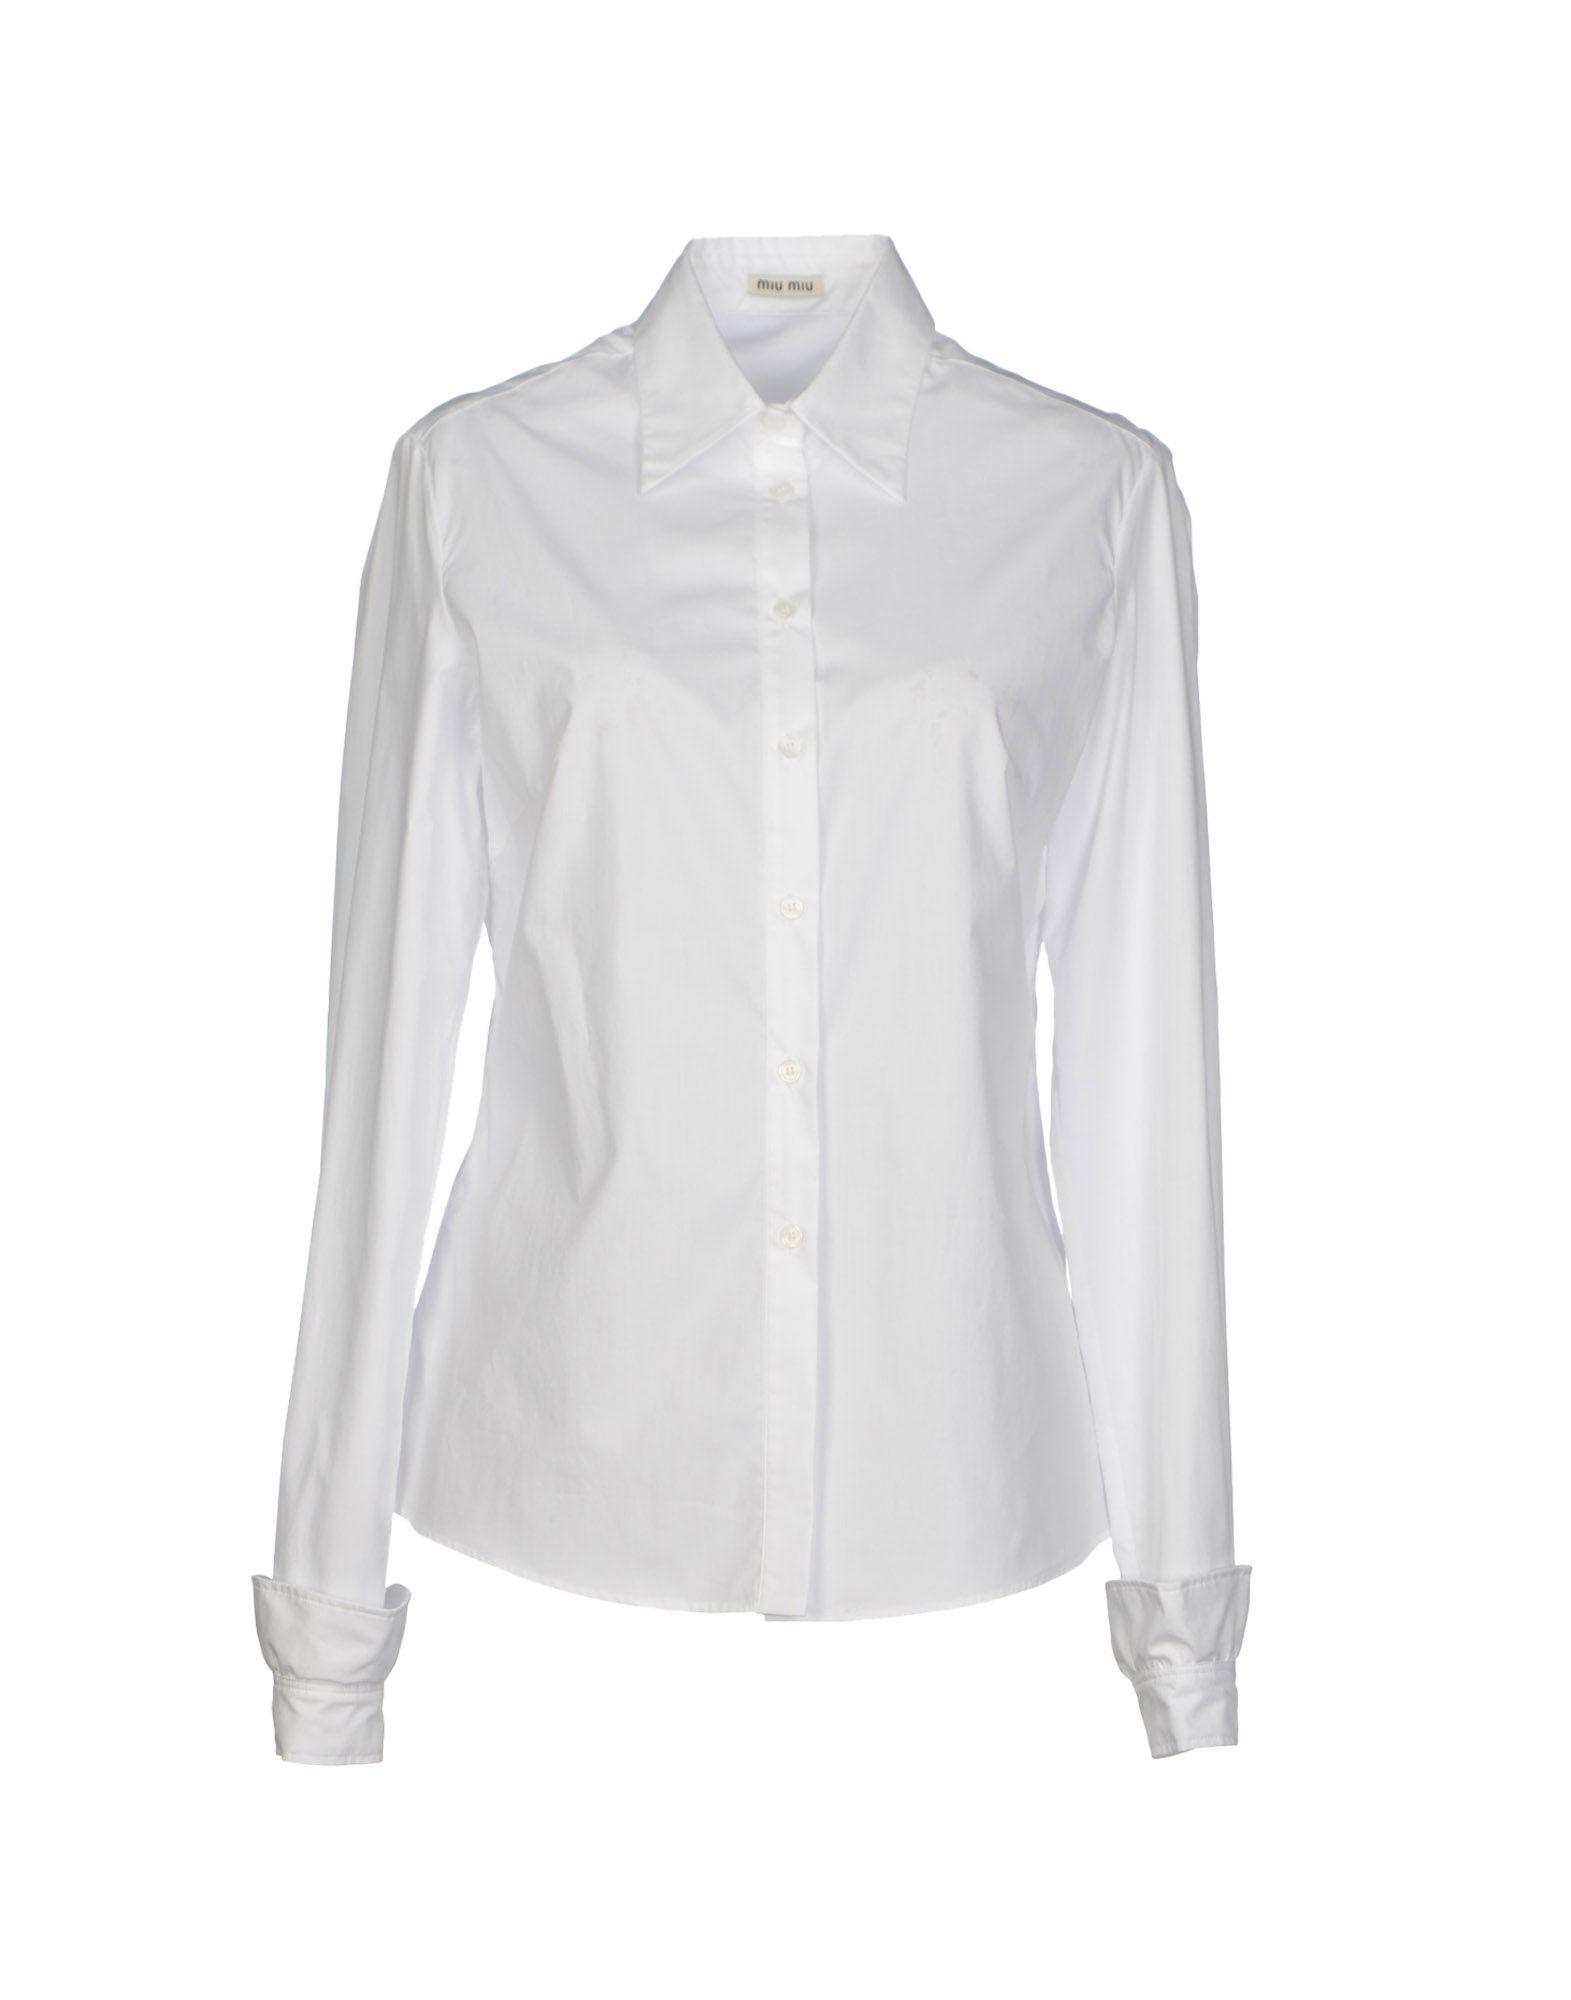 Miu miu shirt in white lyst for Miu miu t shirt